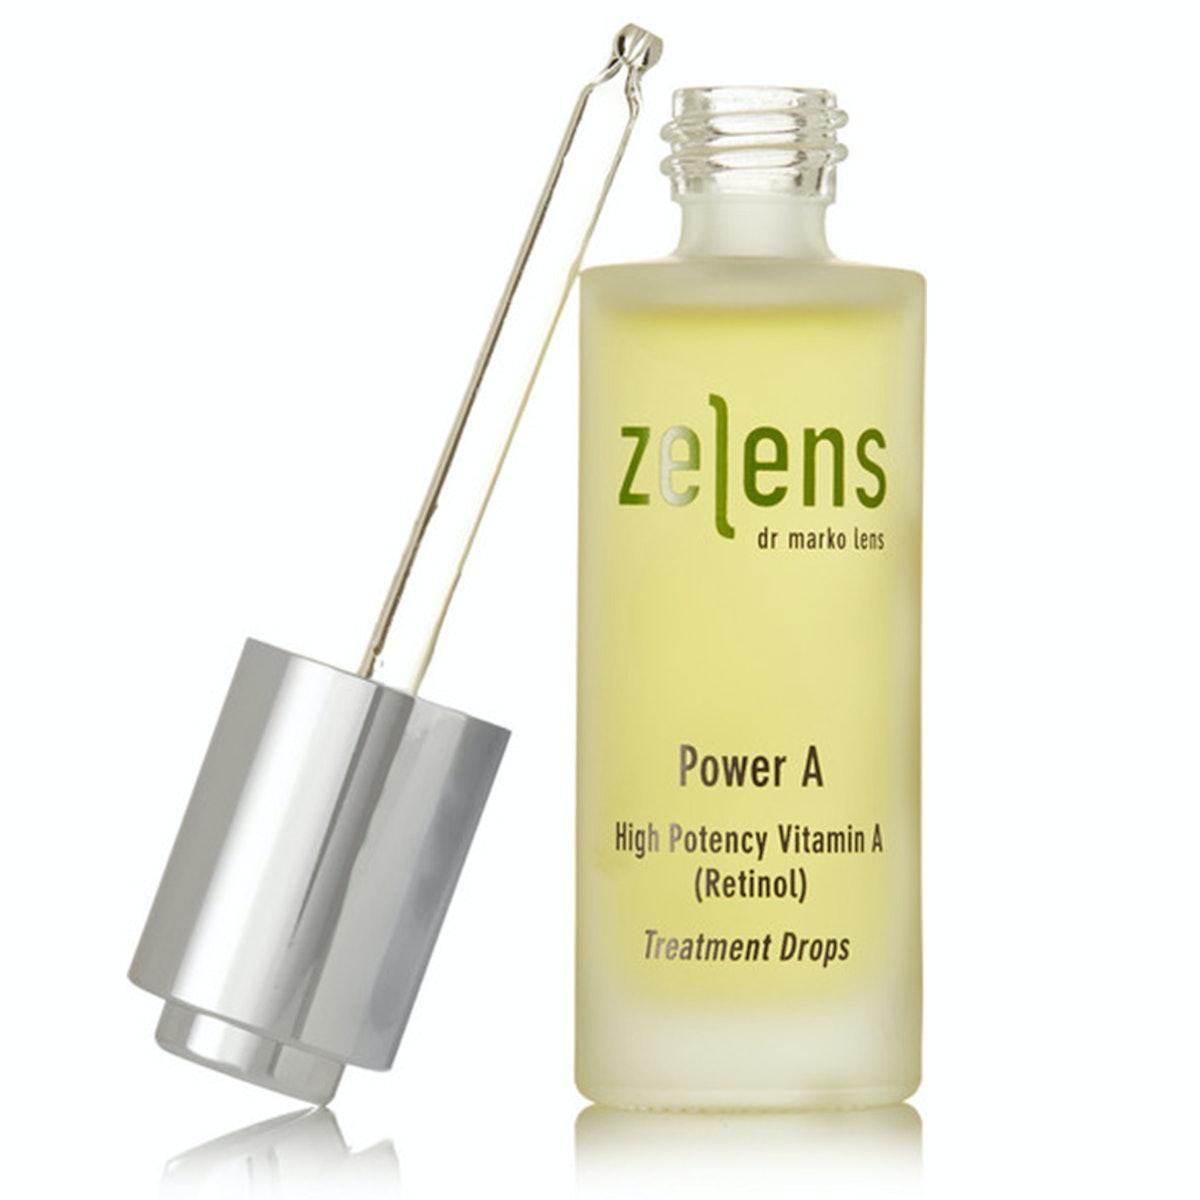 Power A High Potency Vitamin A Treatment Drops